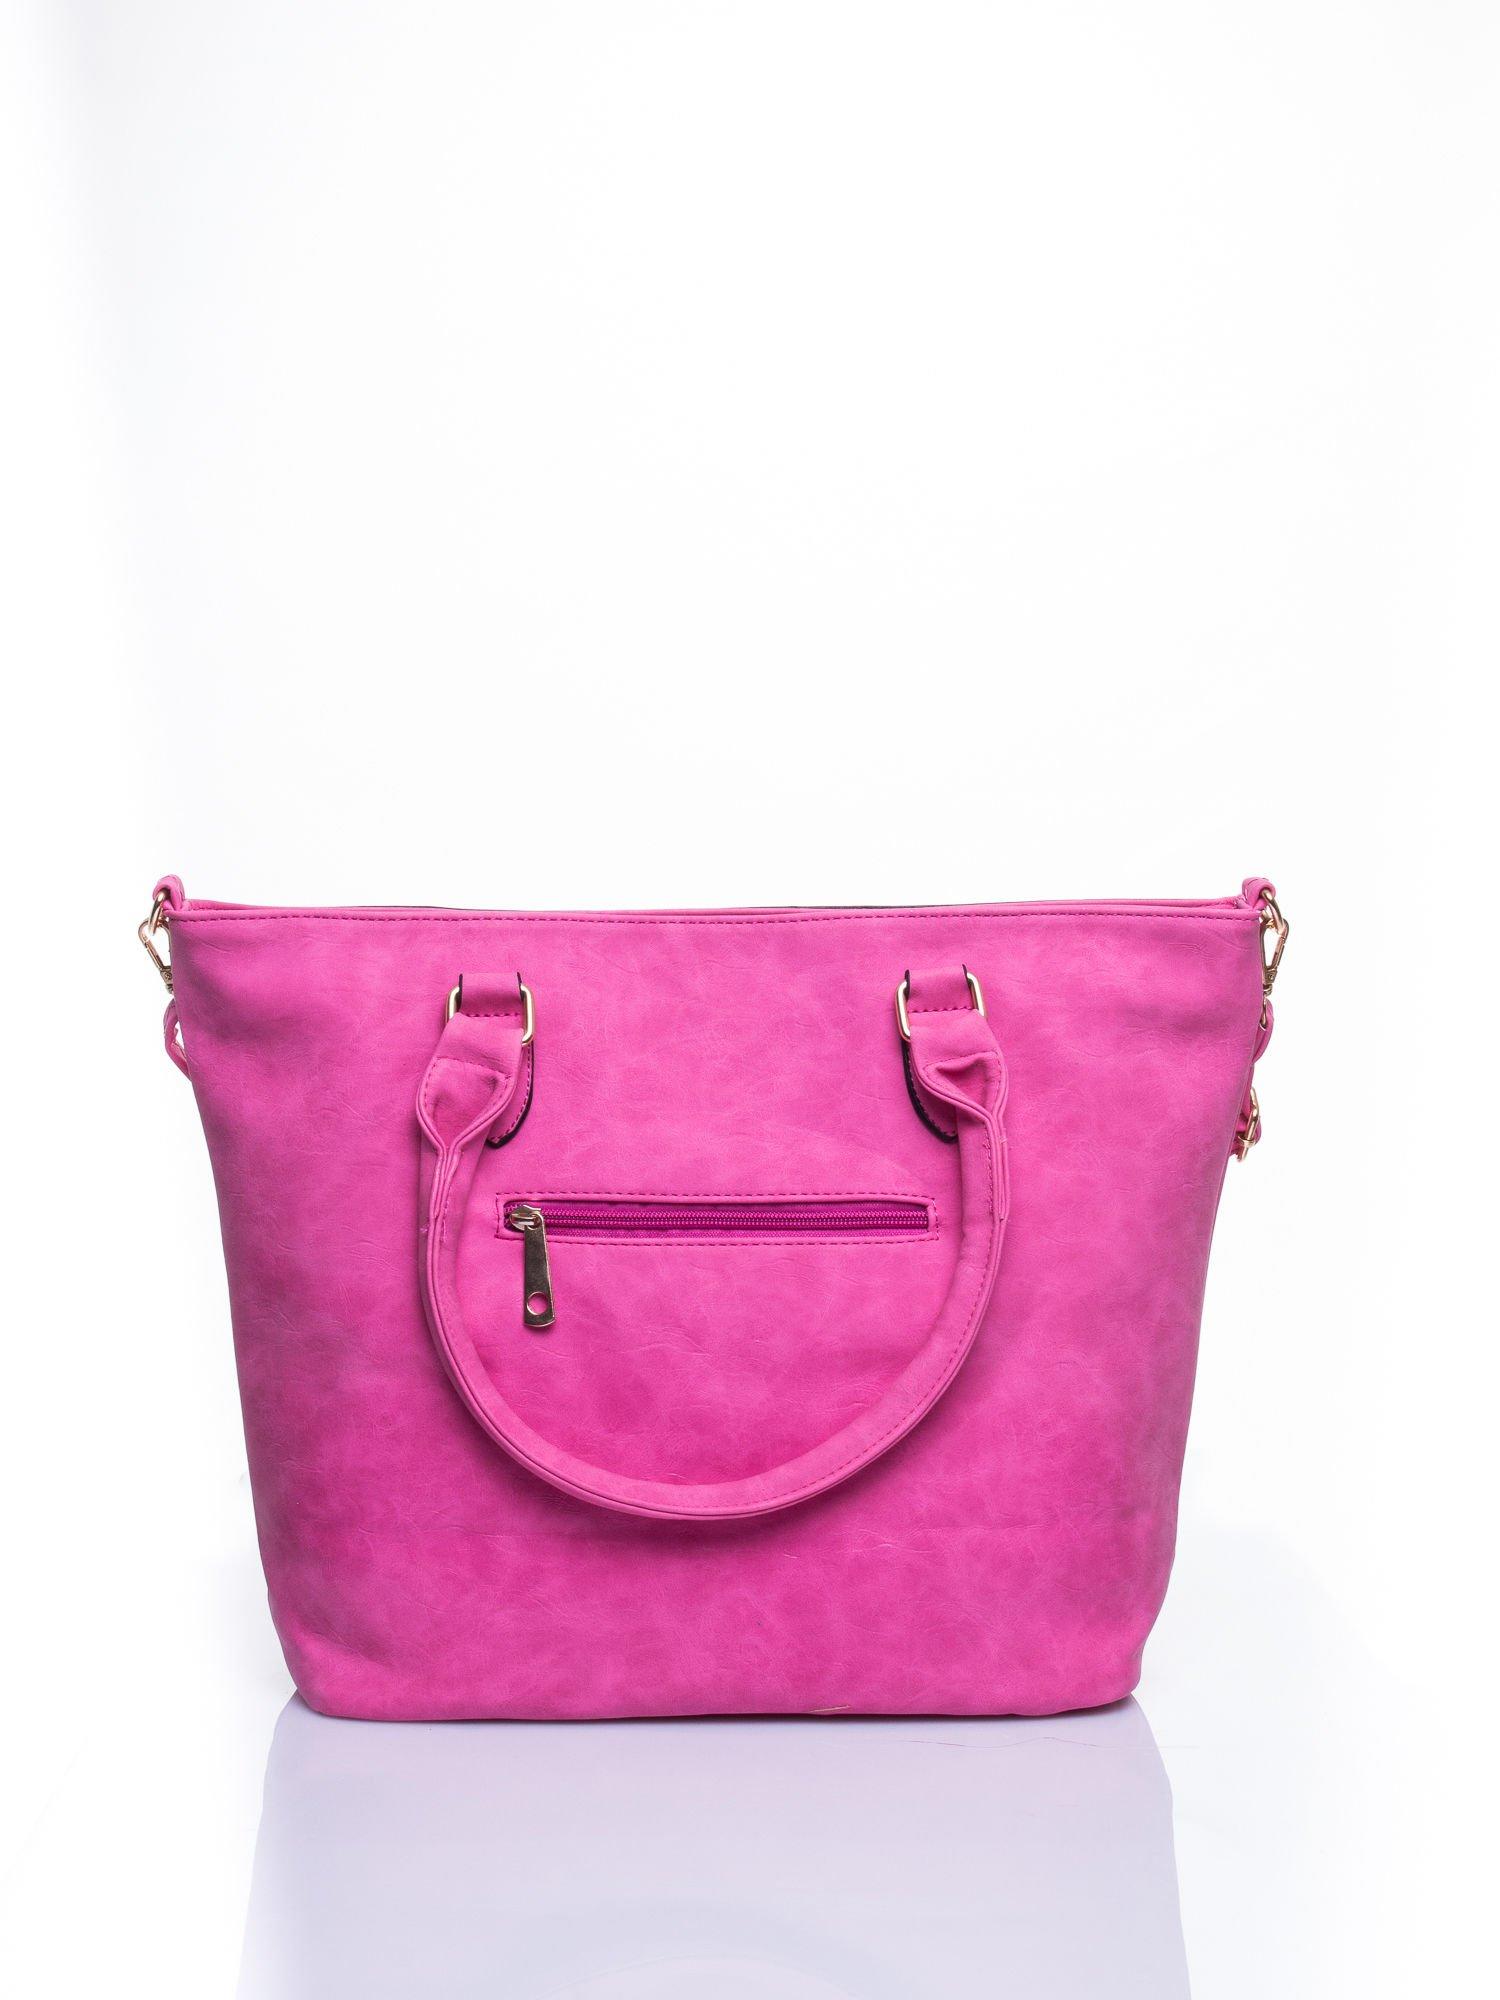 Jasnoróżoa torba city bag na ramię                                  zdj.                                  3